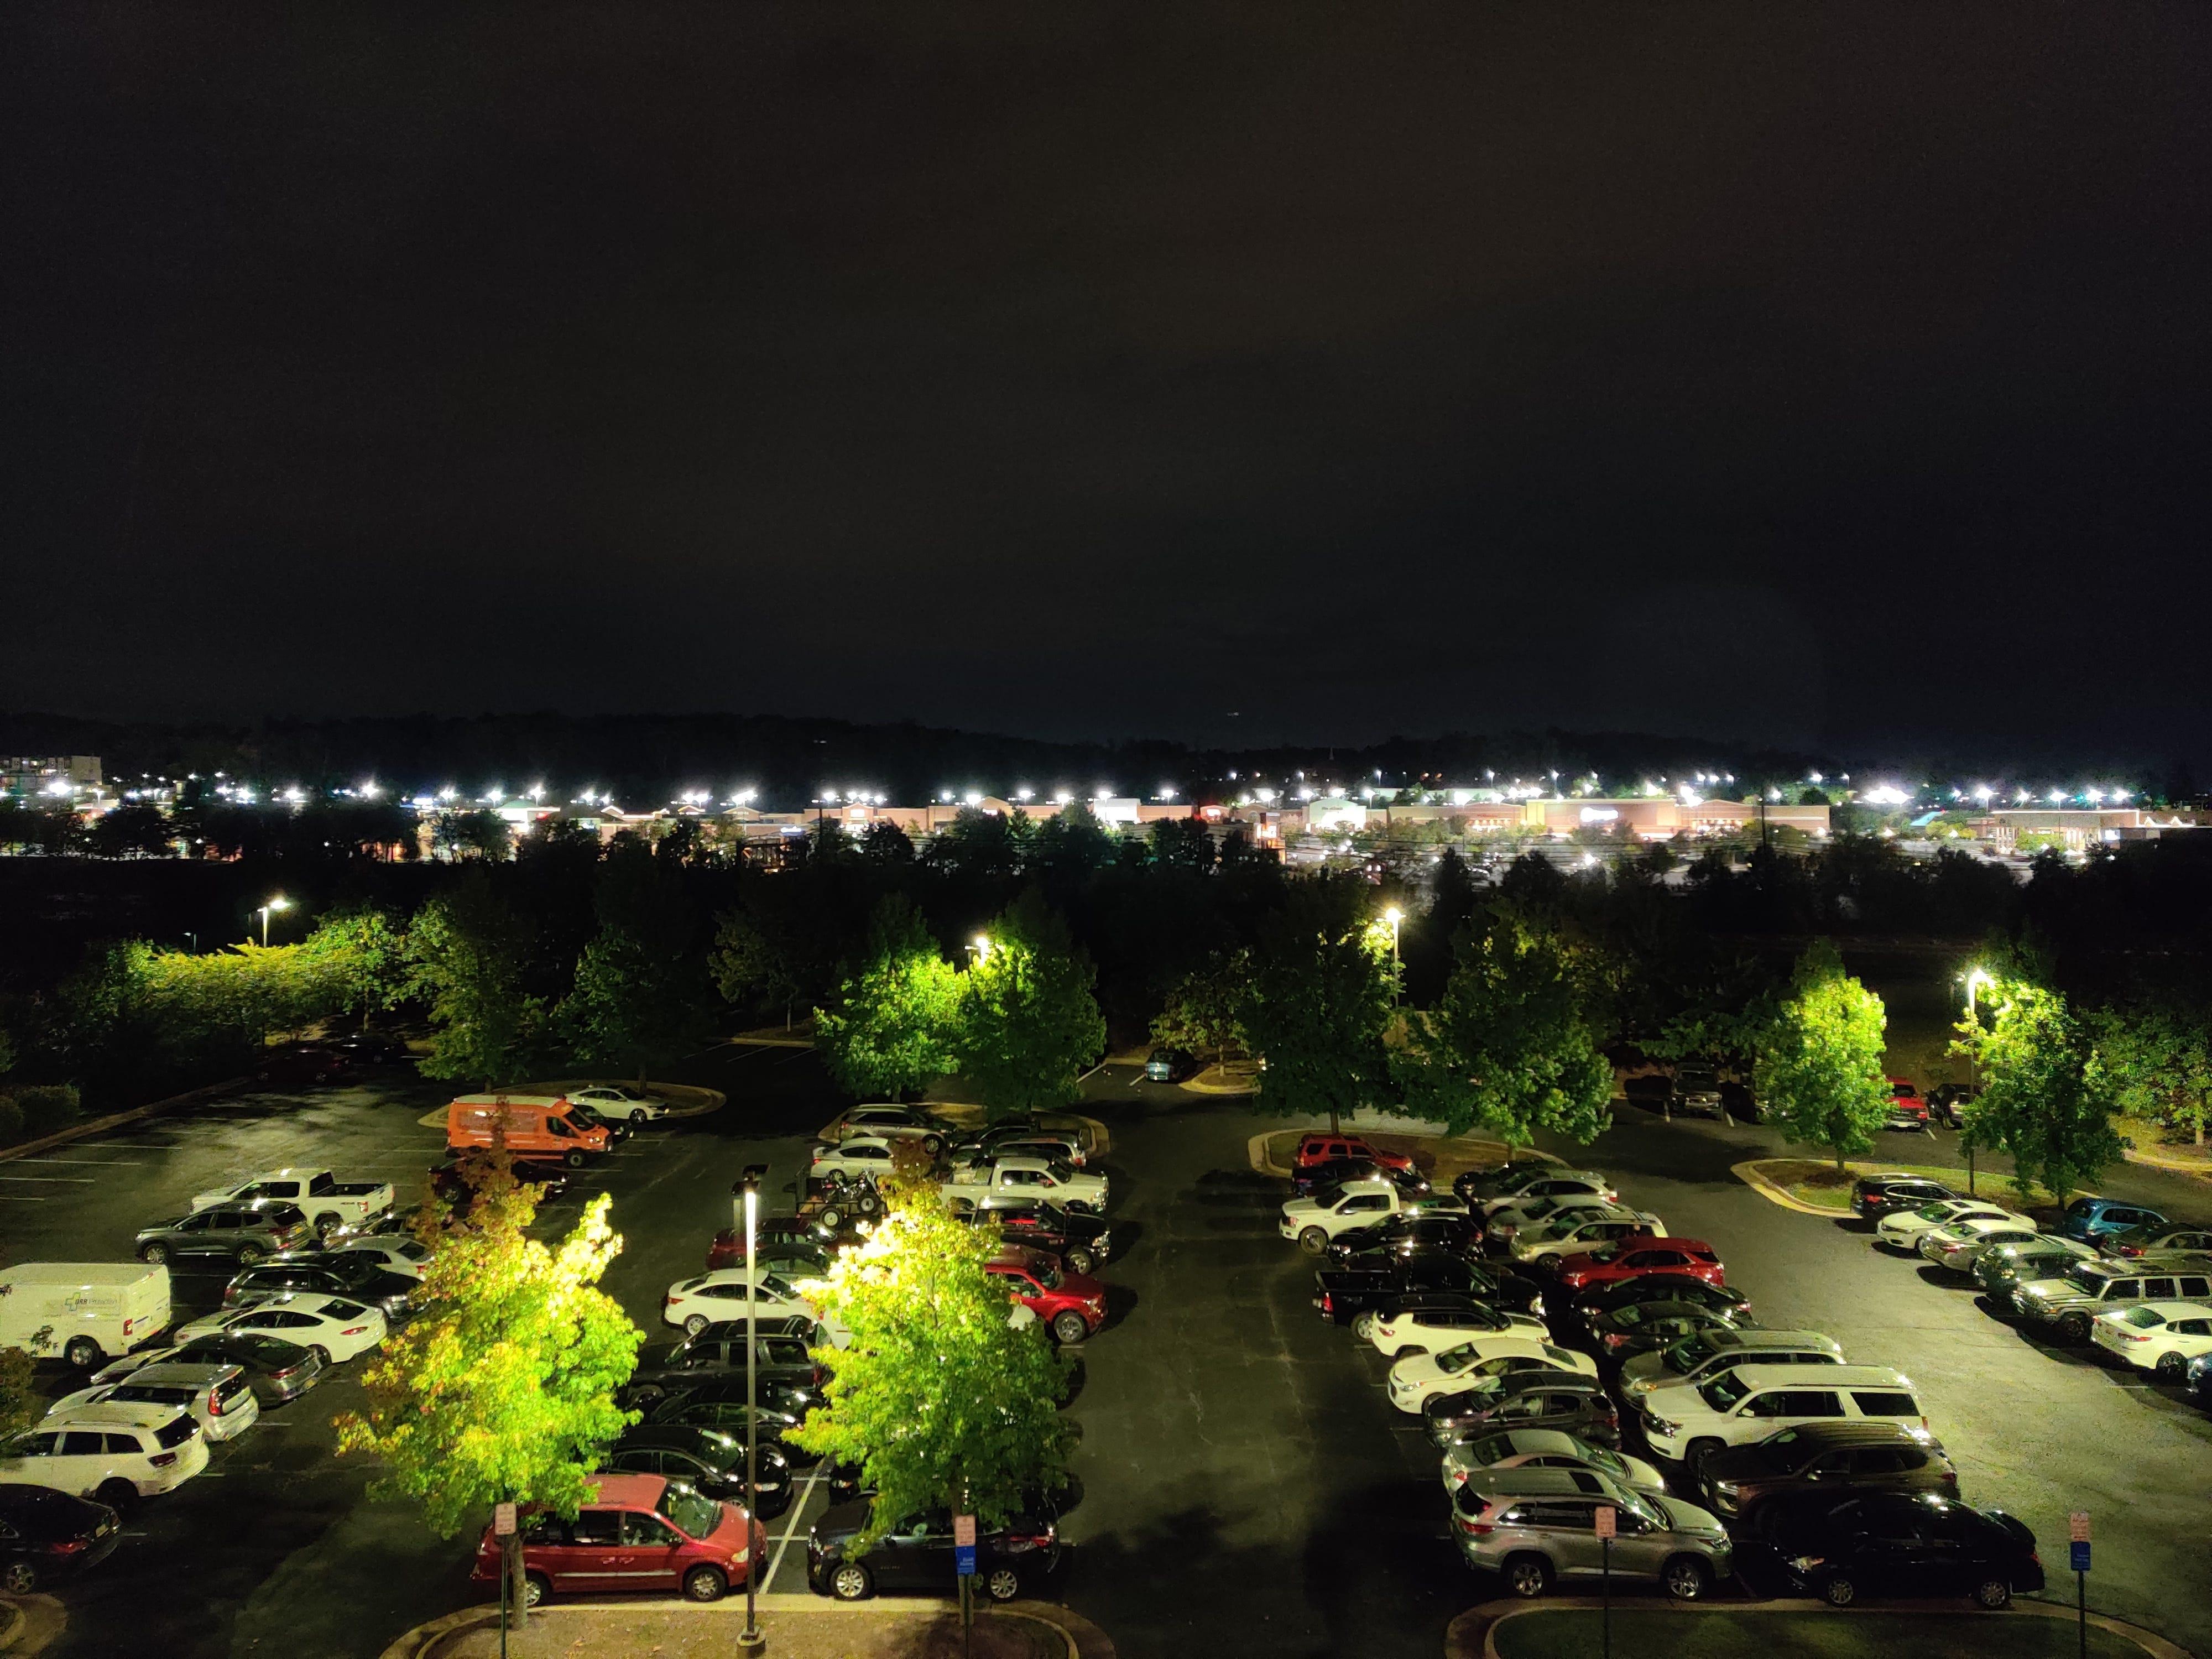 OnePlus 7T camera sample at night